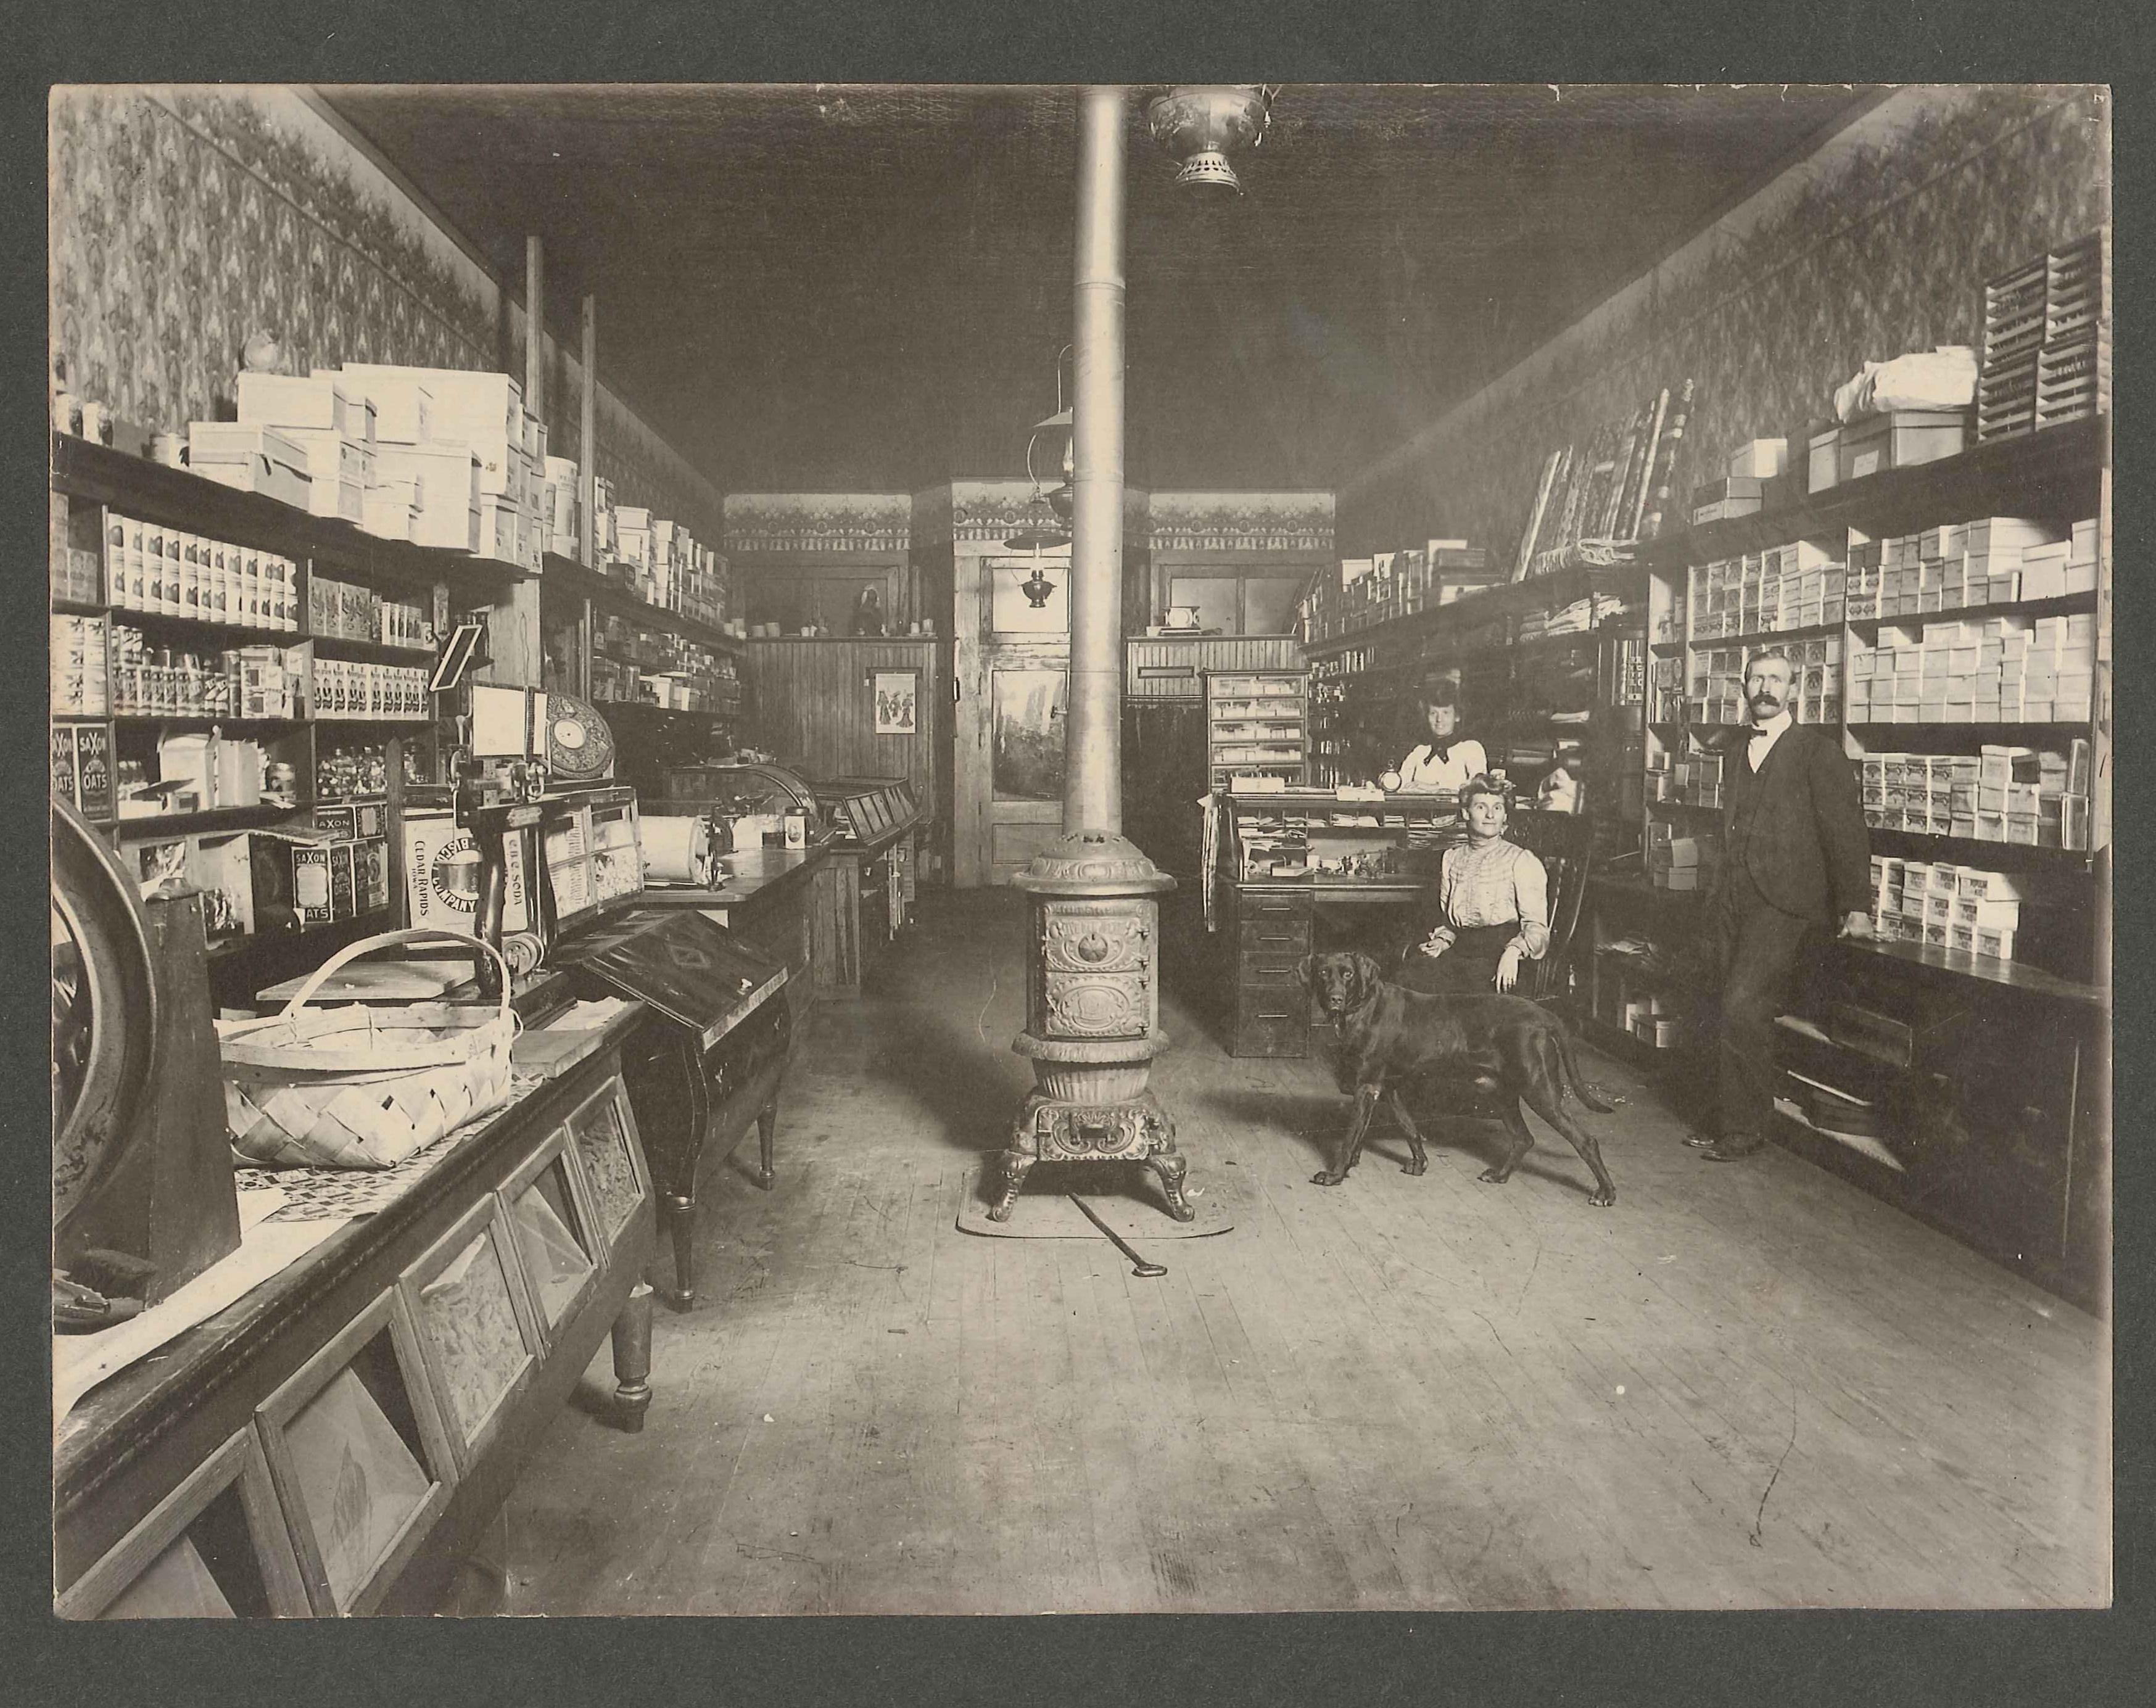 Hardware store, 1882